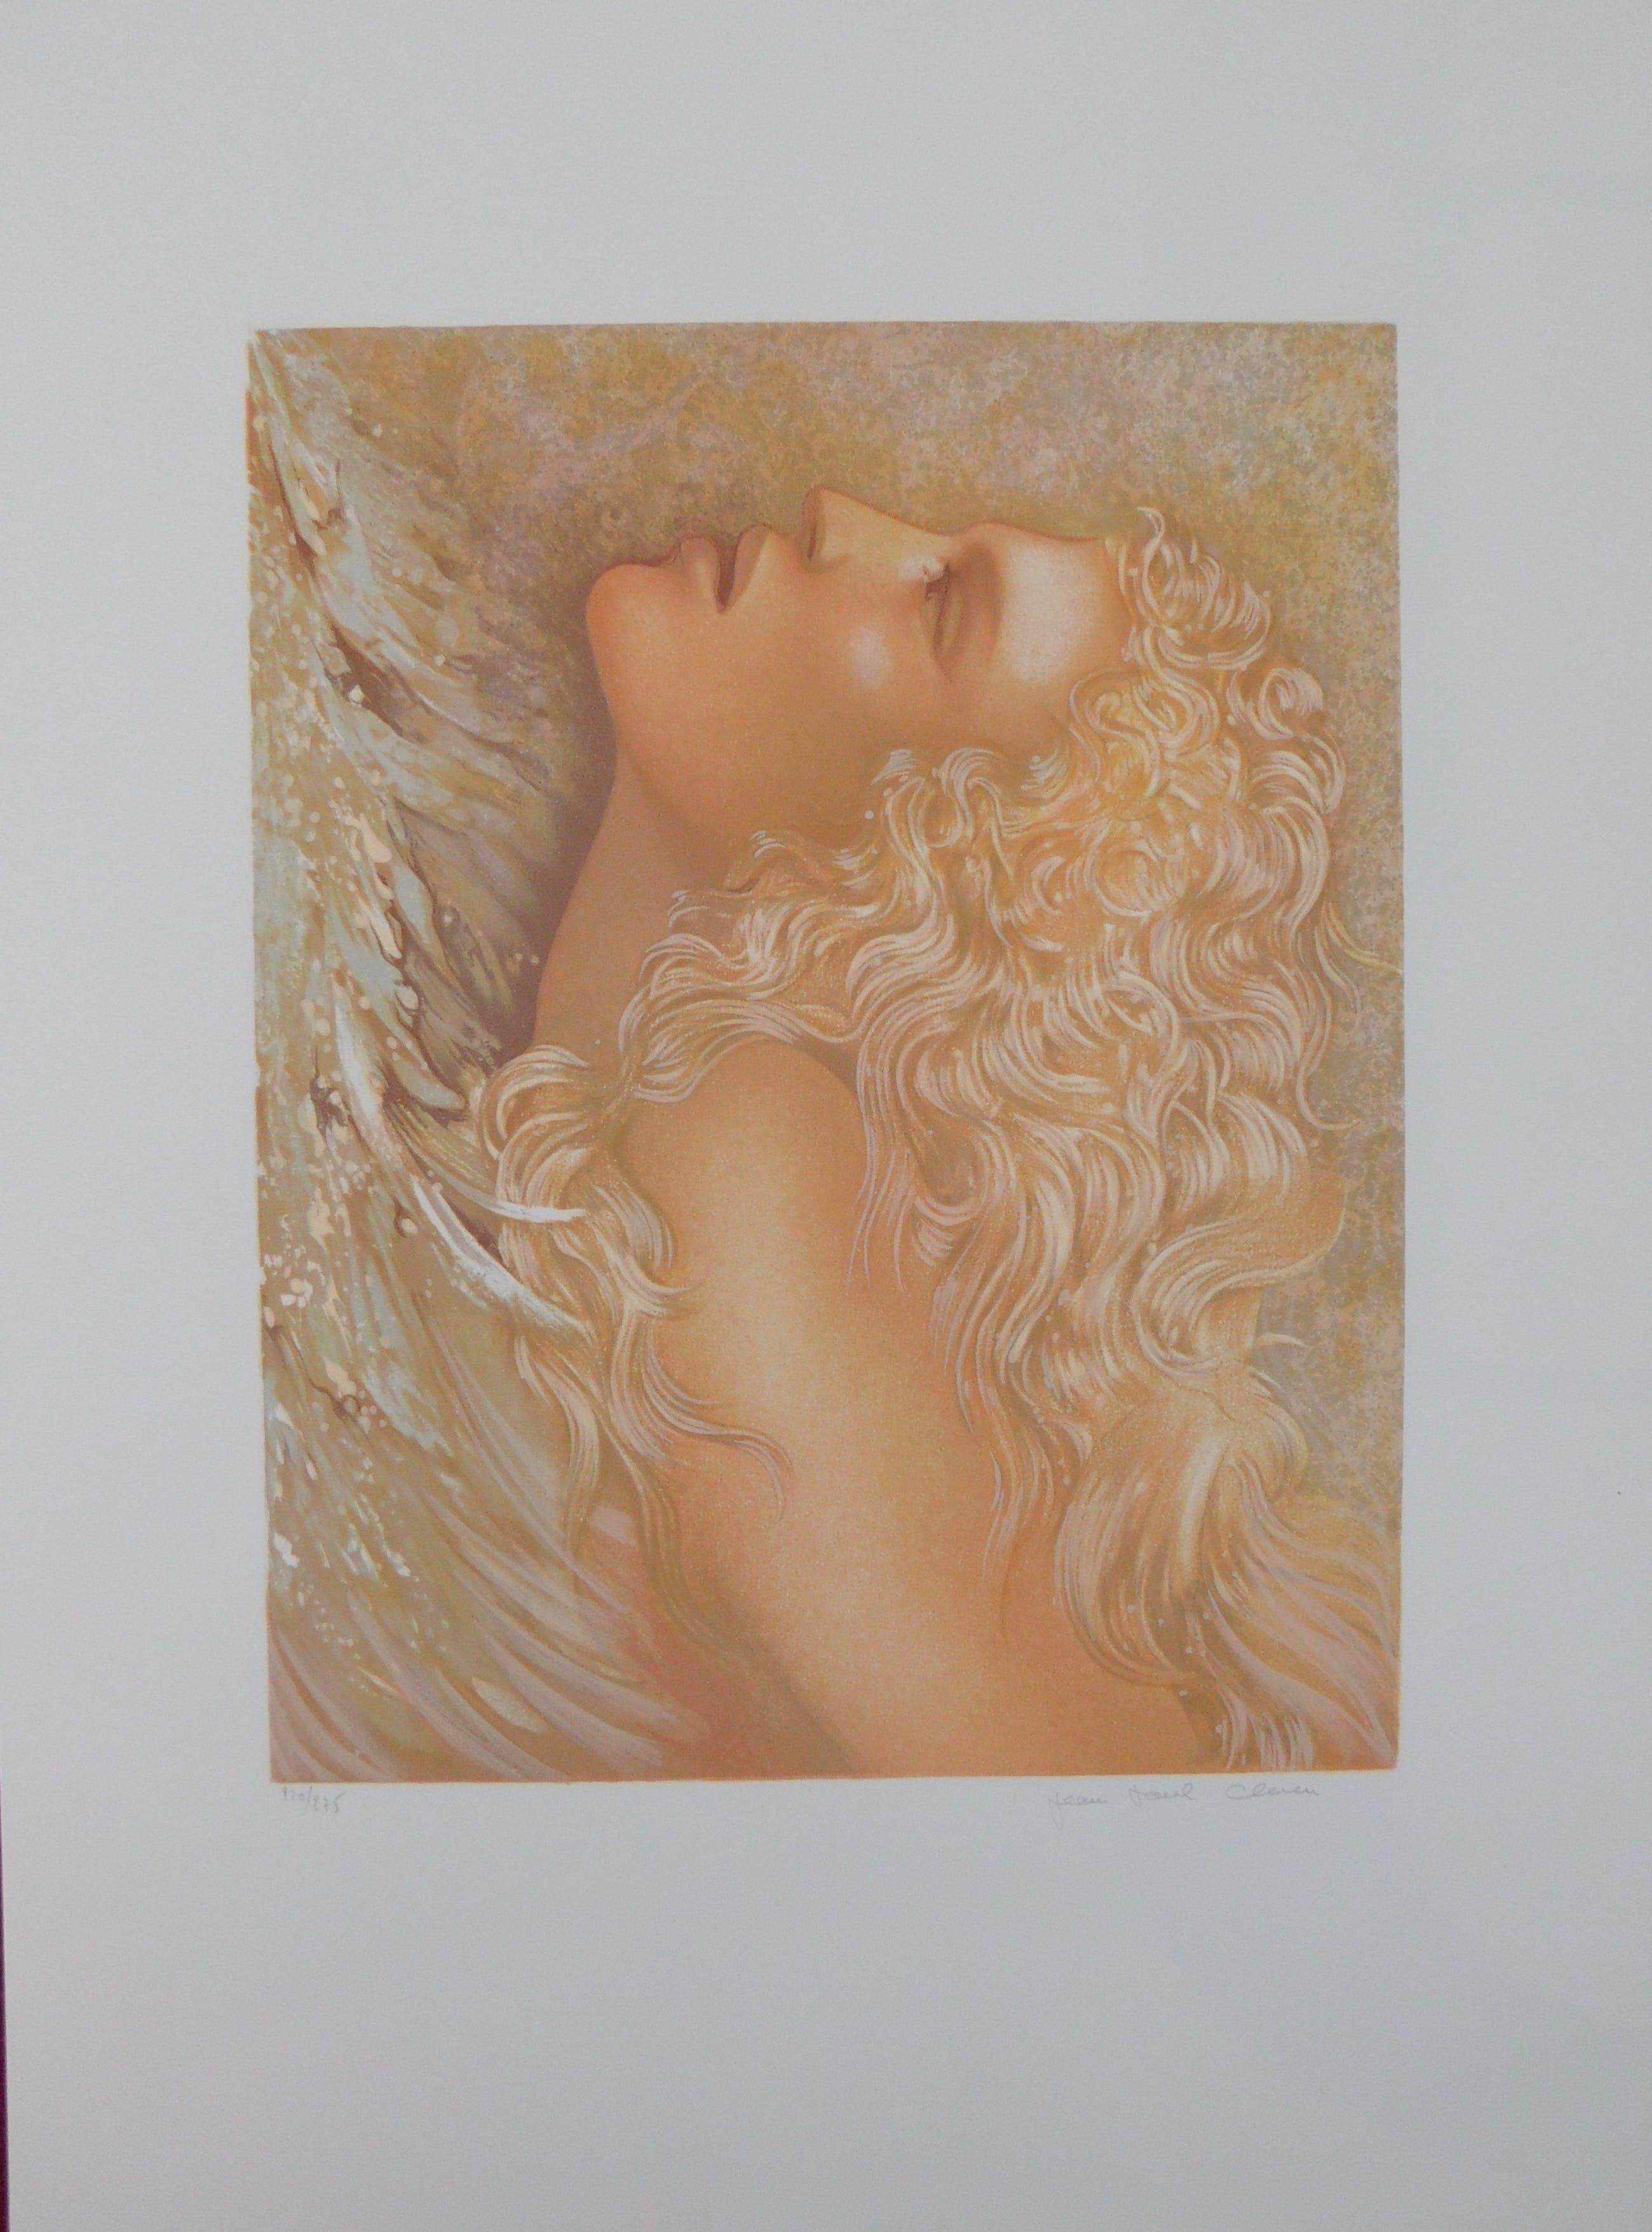 Jean-Paul Cleren - La Blonde Surréaliste kopen? Bied vanaf 15!